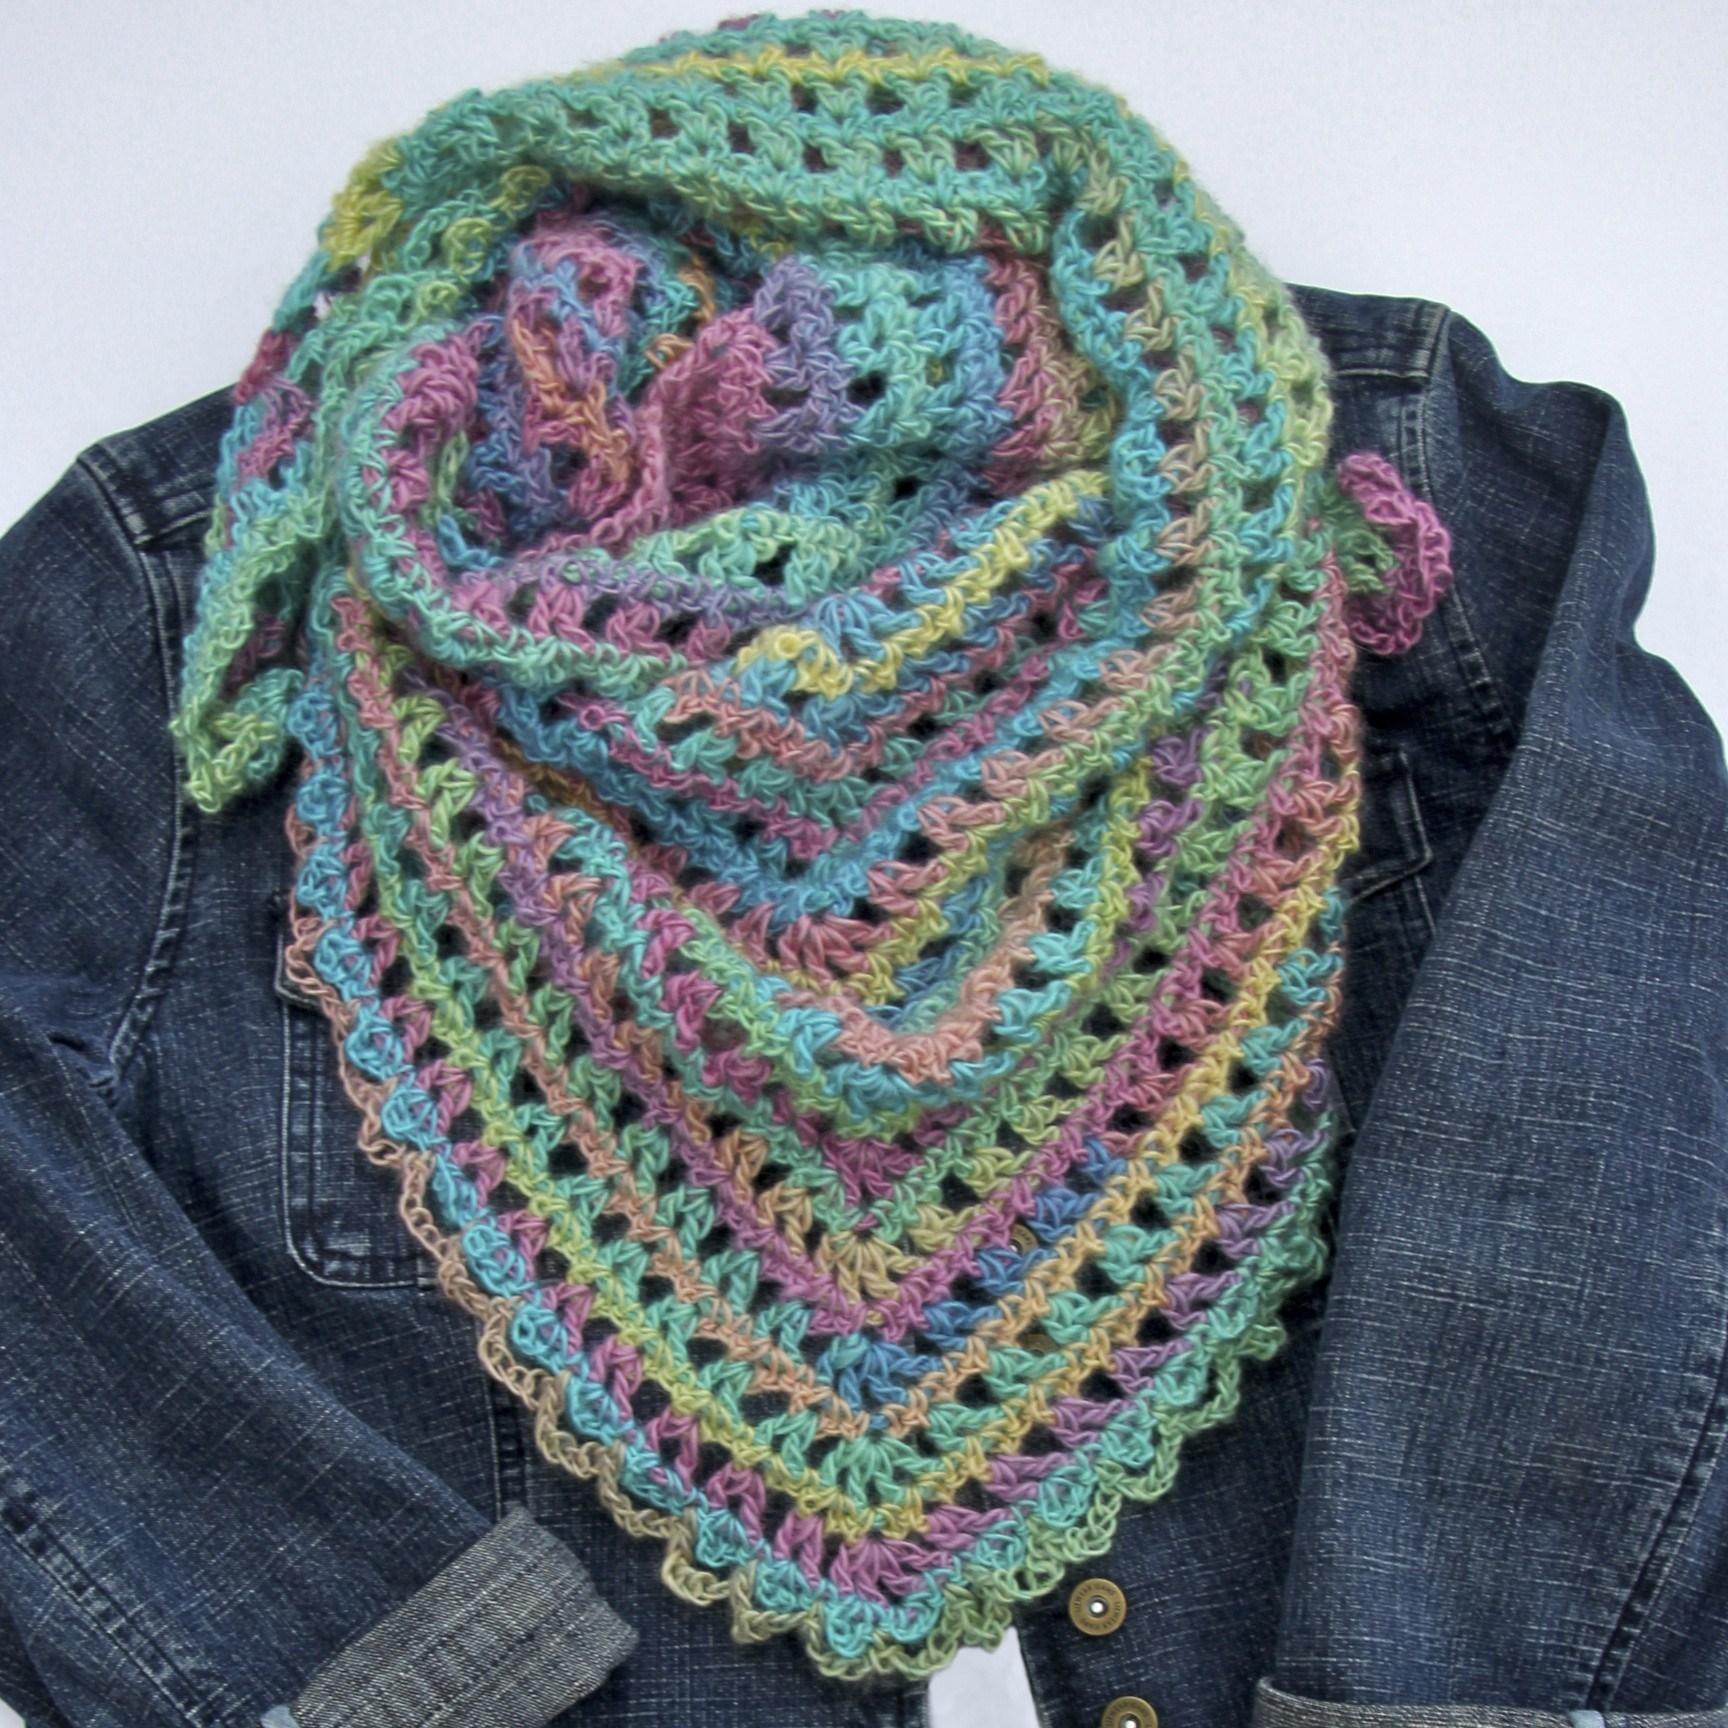 Crochet Scarf Free Patterns